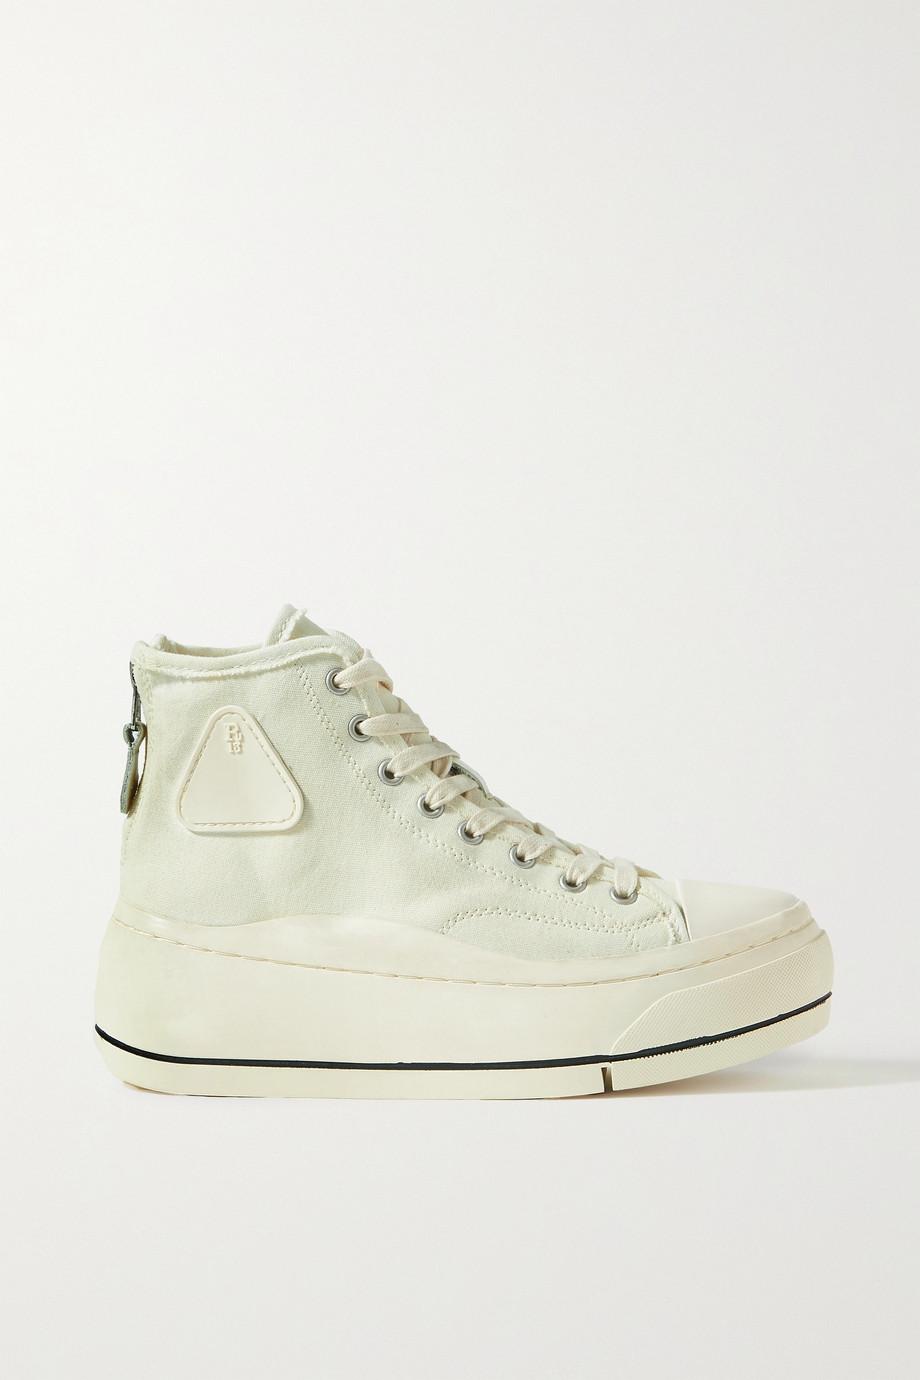 R13 Canvas high-top platform sneakers